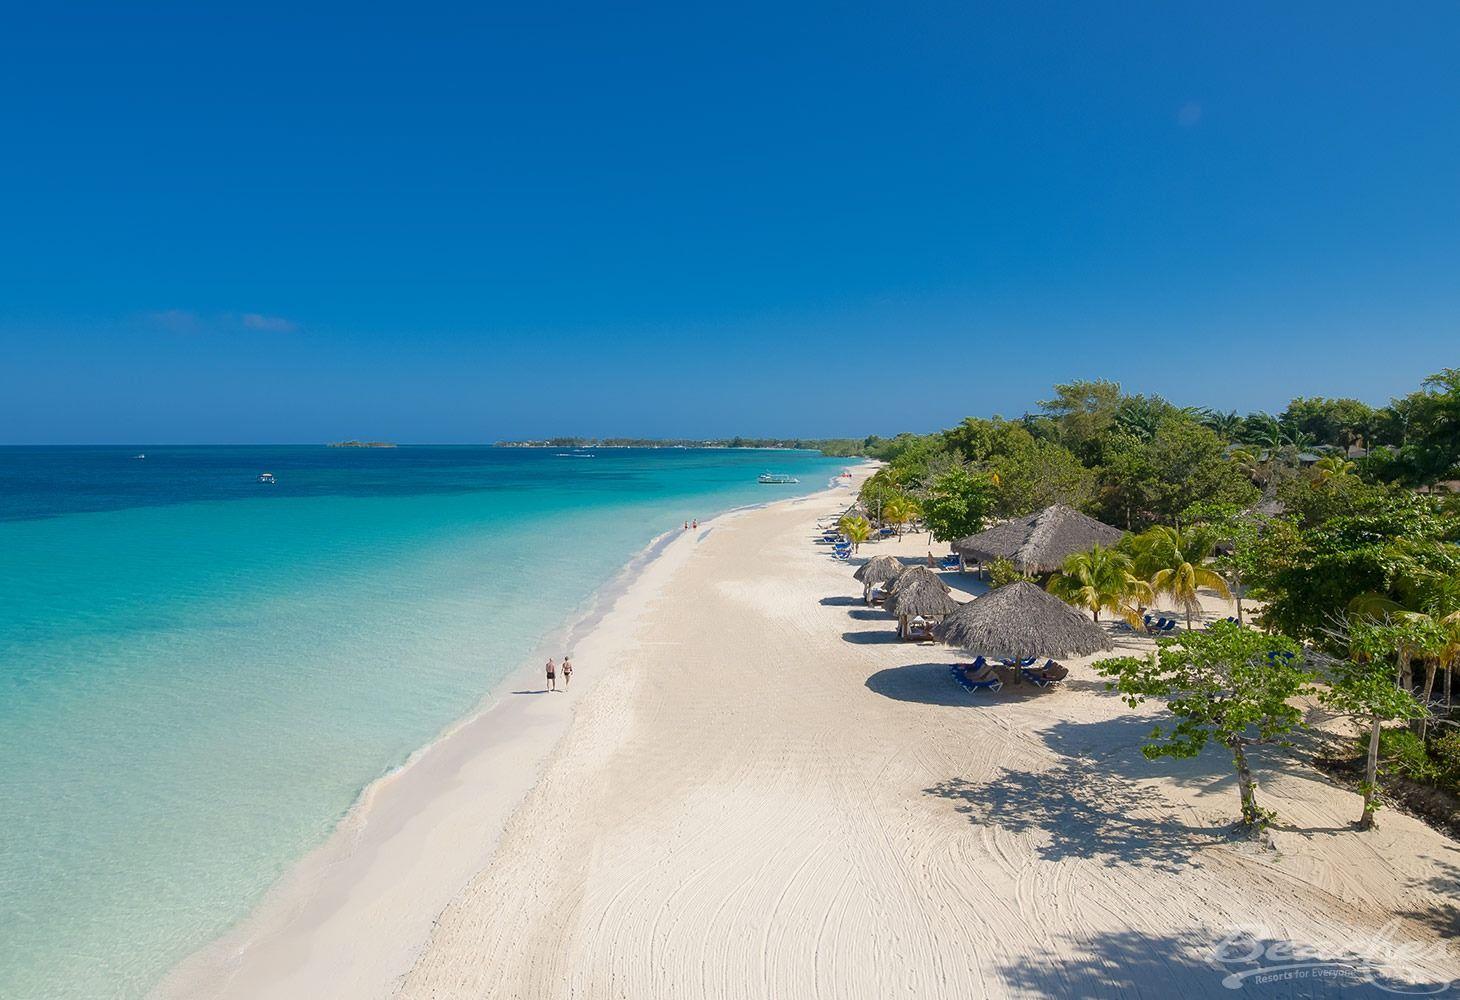 Beaches-Negril-beach-and-cabanas